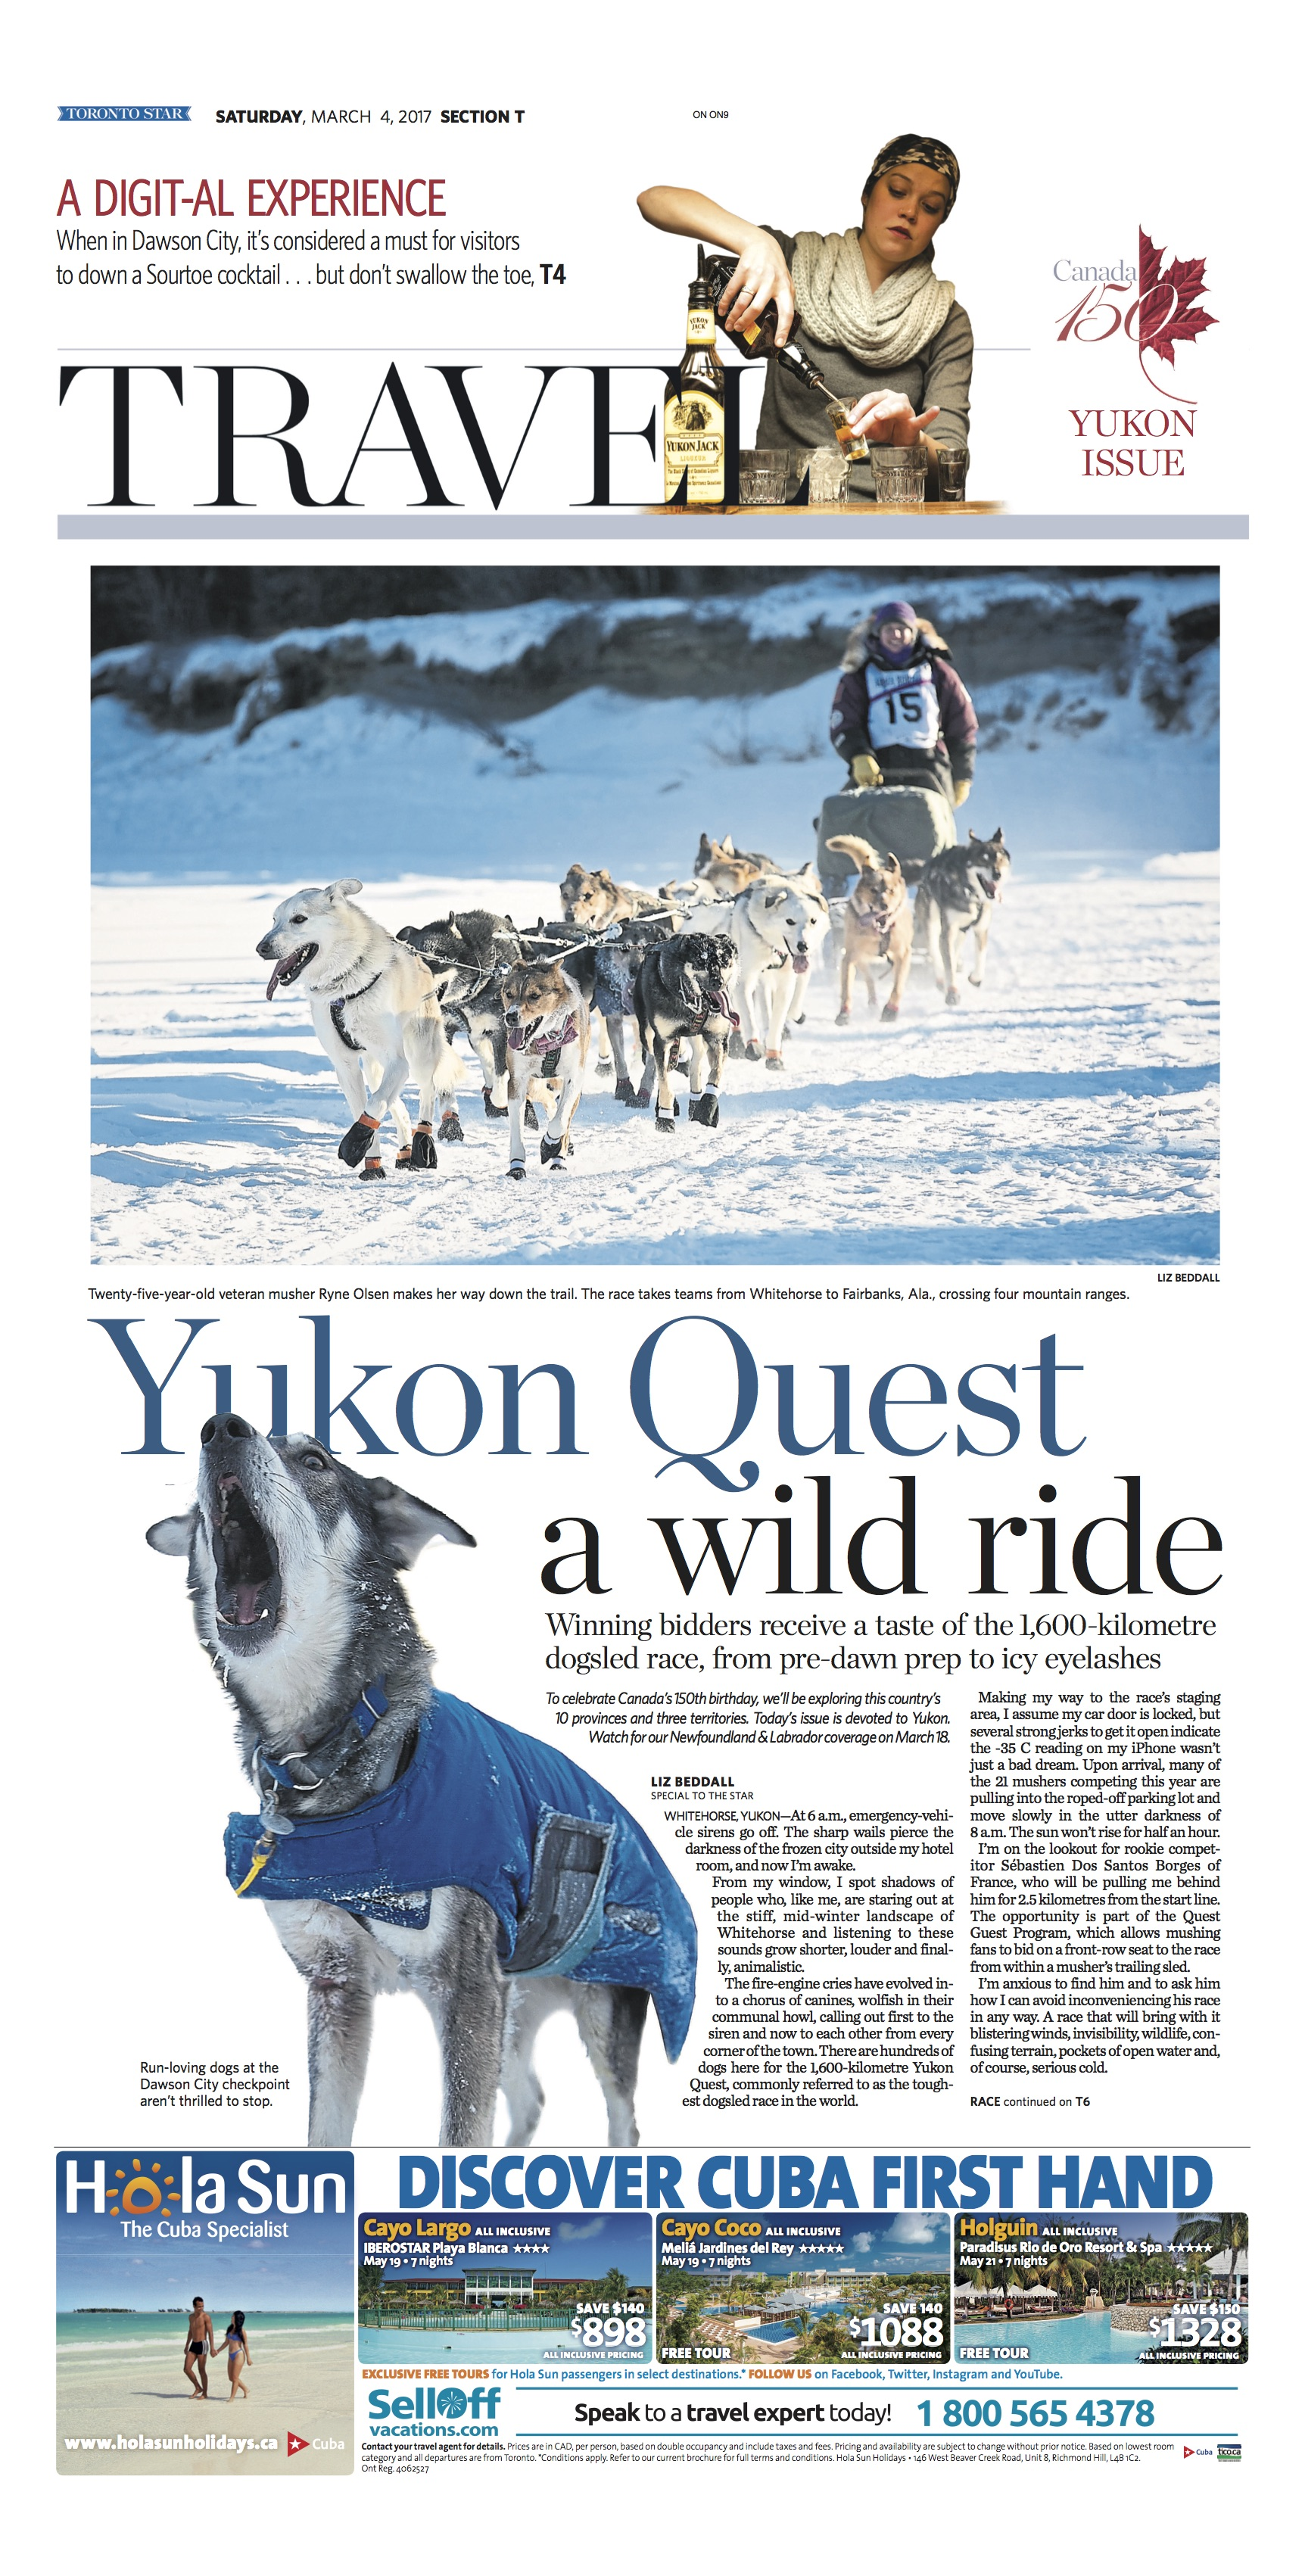 Whitehorse, Yukon: Mar. 4, 2017